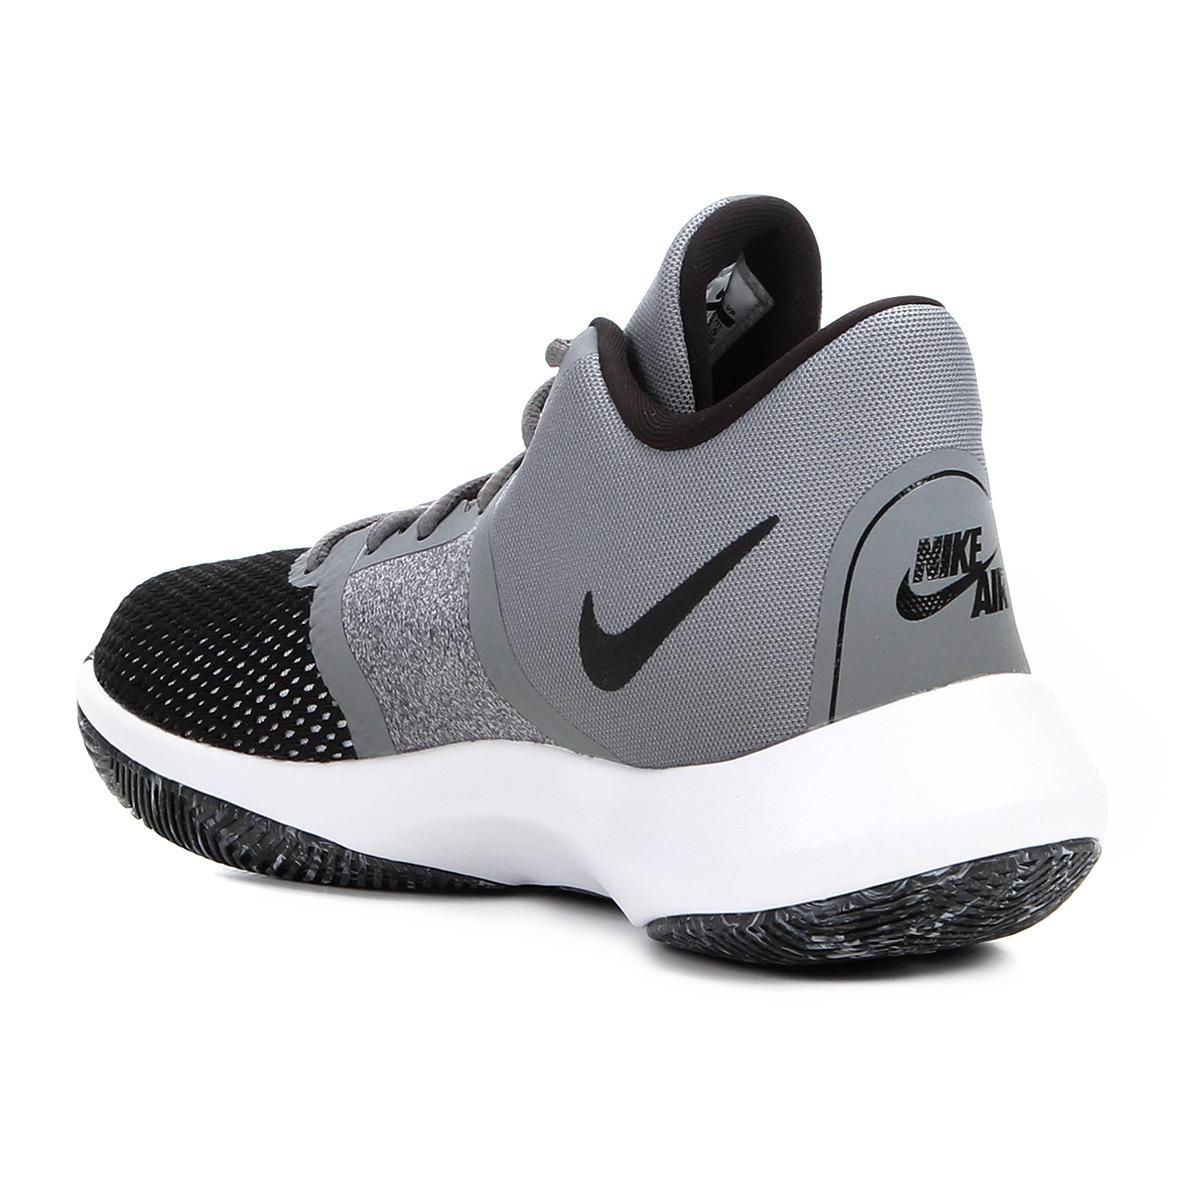 Tênis Nike Air Precision Nbk Masculino Ii - Cinza E Preto - R  289 ... 516d58bd9aff0